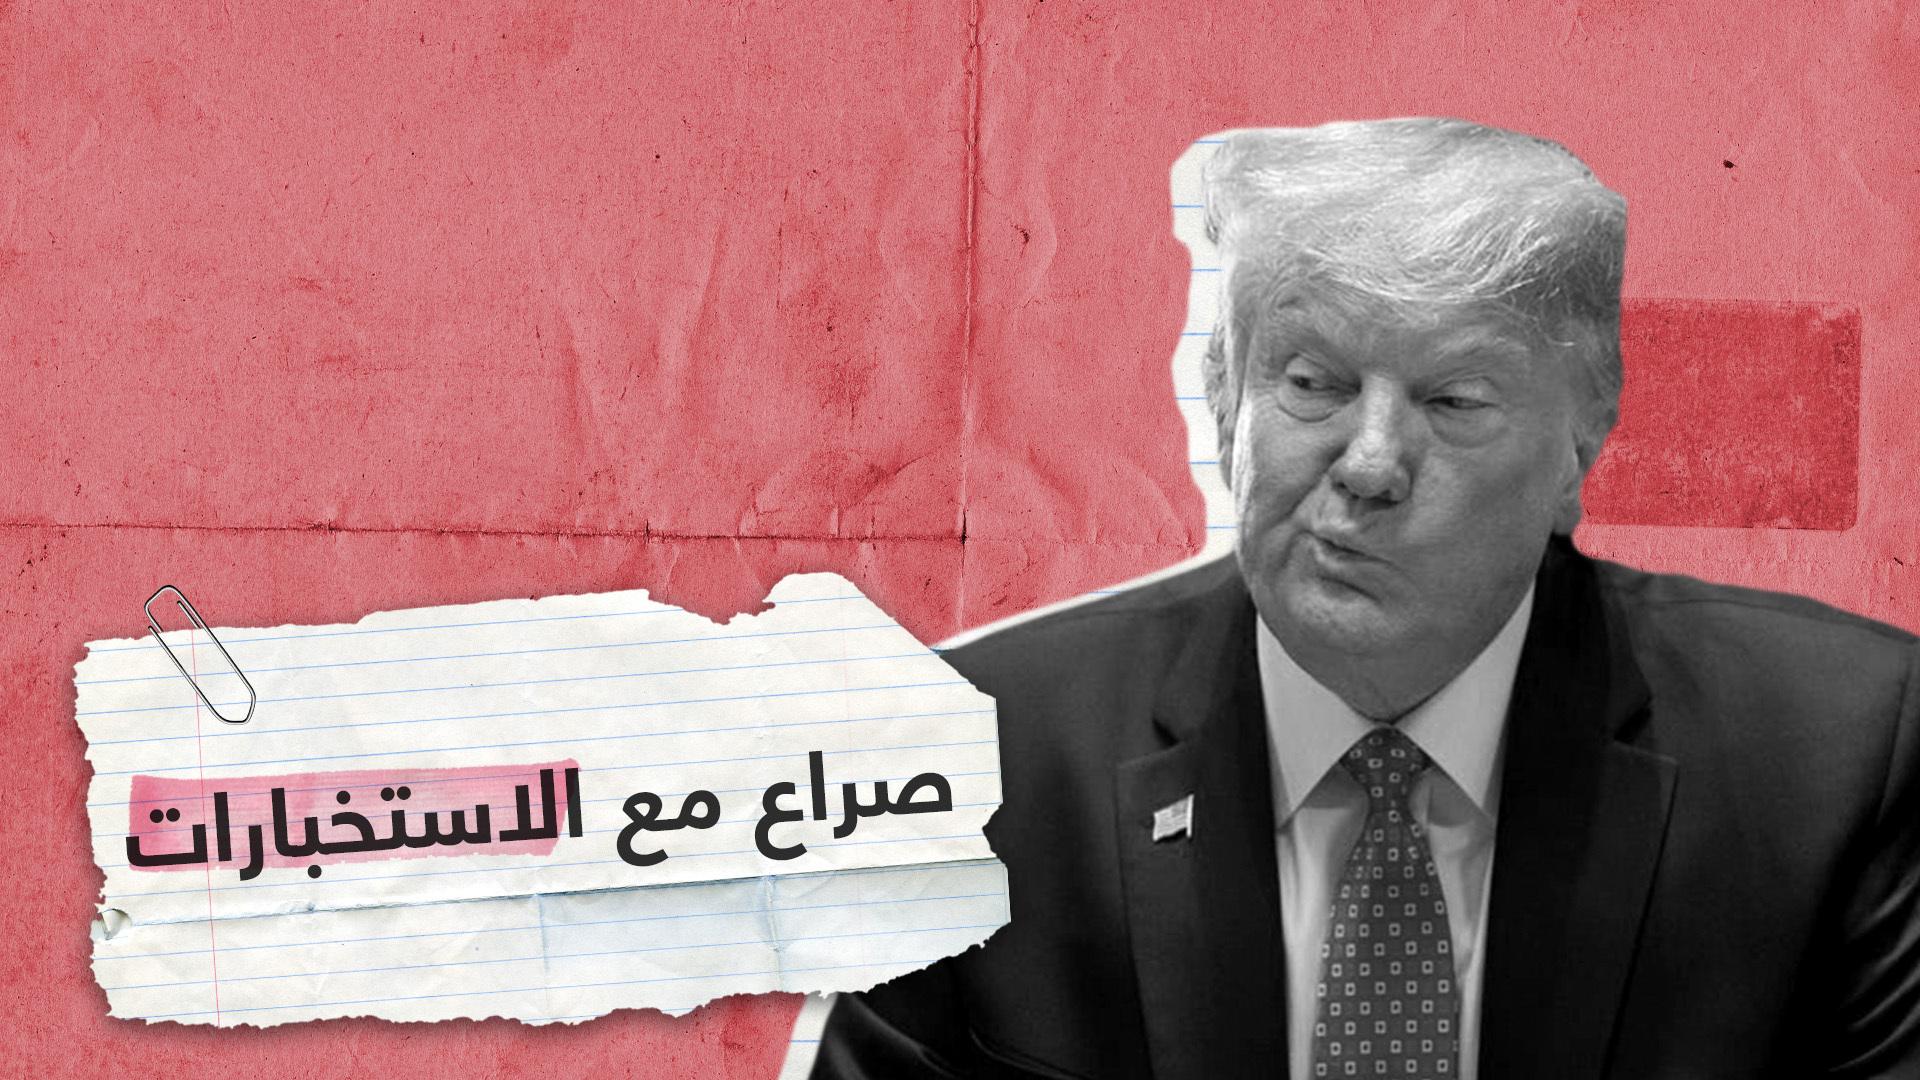 ترامب وصراعه مع الاستخبارات